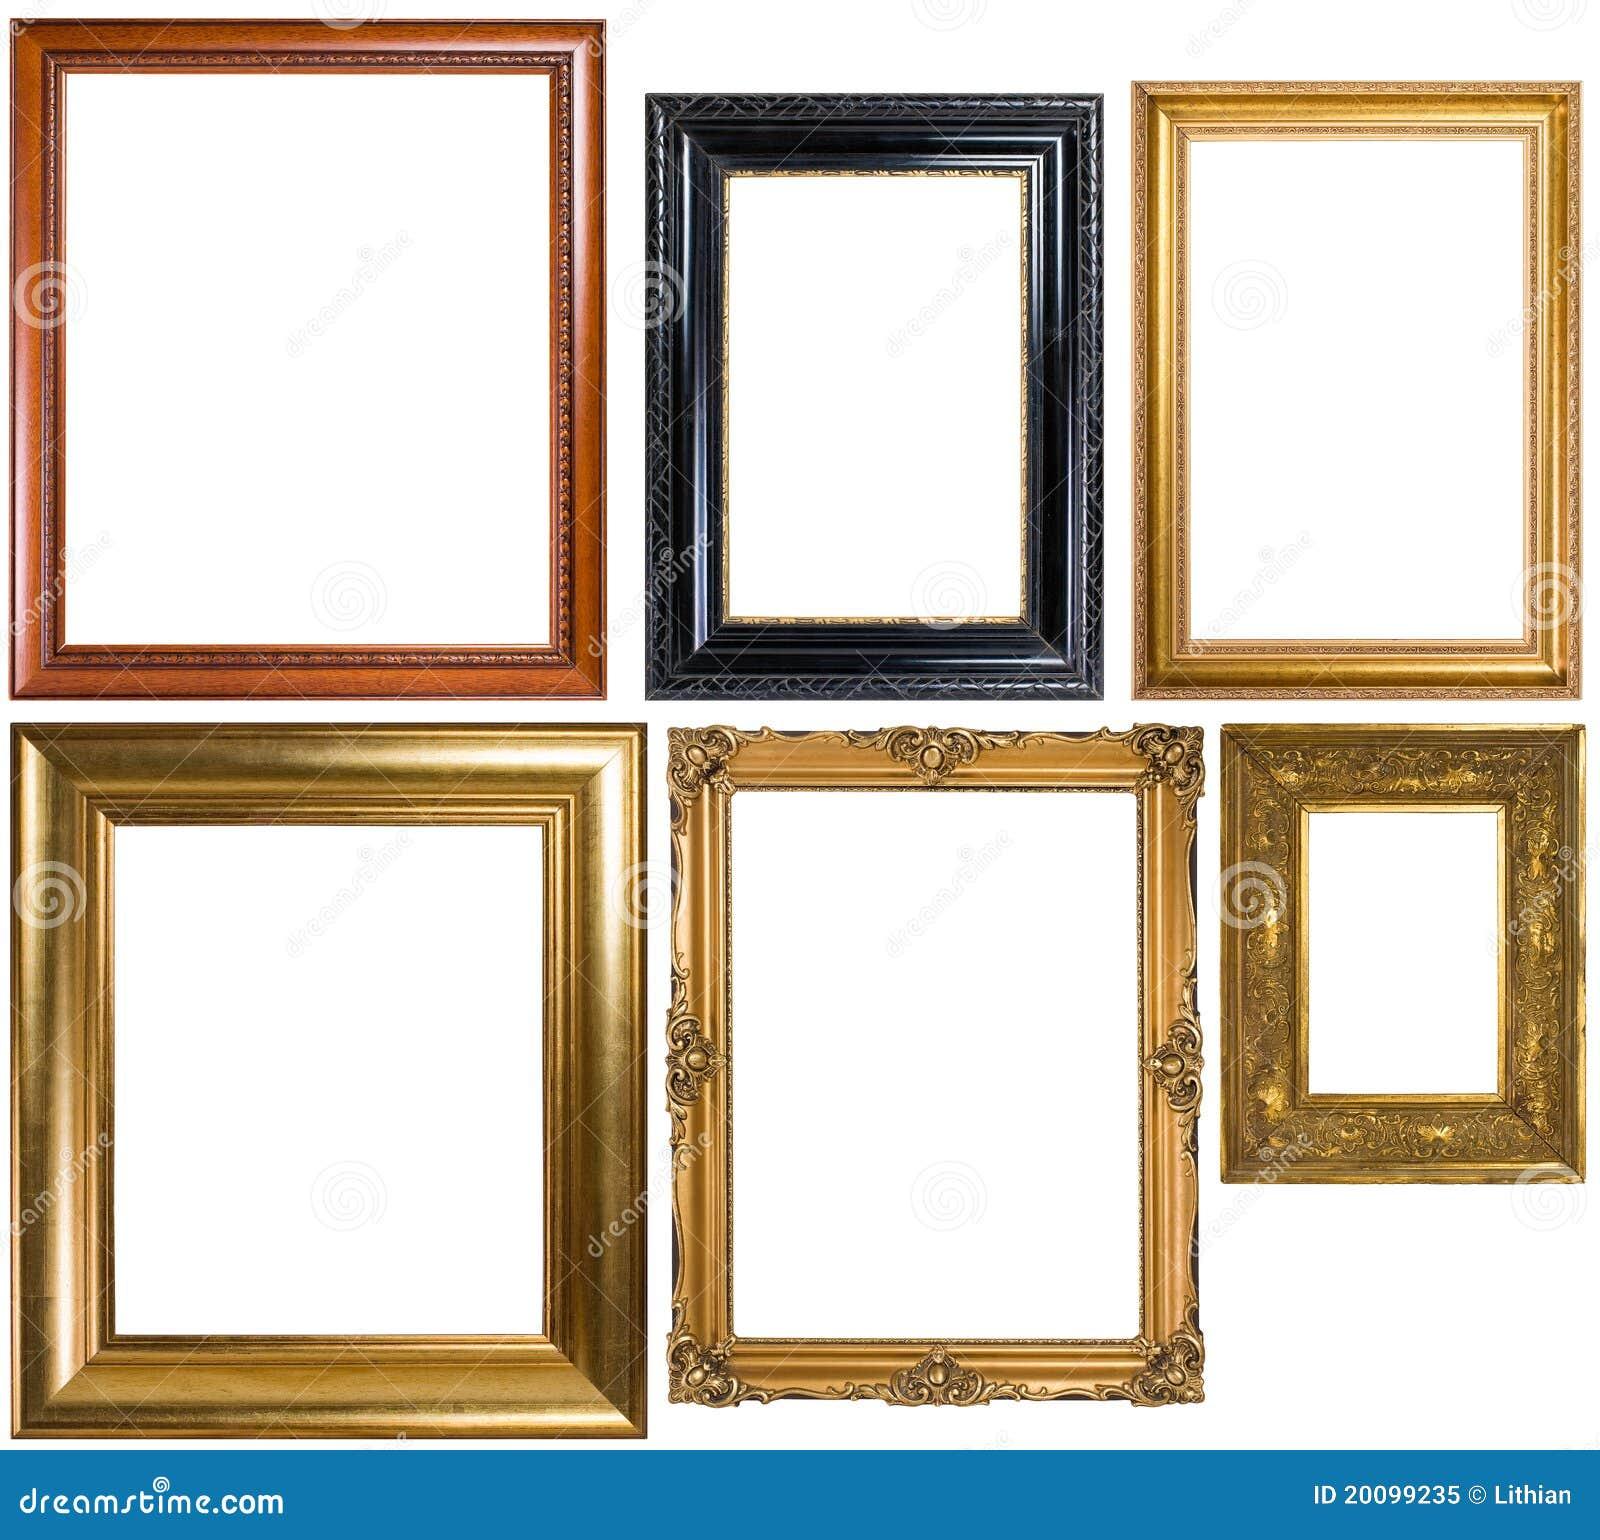 Exelent Classic Frames Sketch - Framed Art Ideas - roadofriches.com